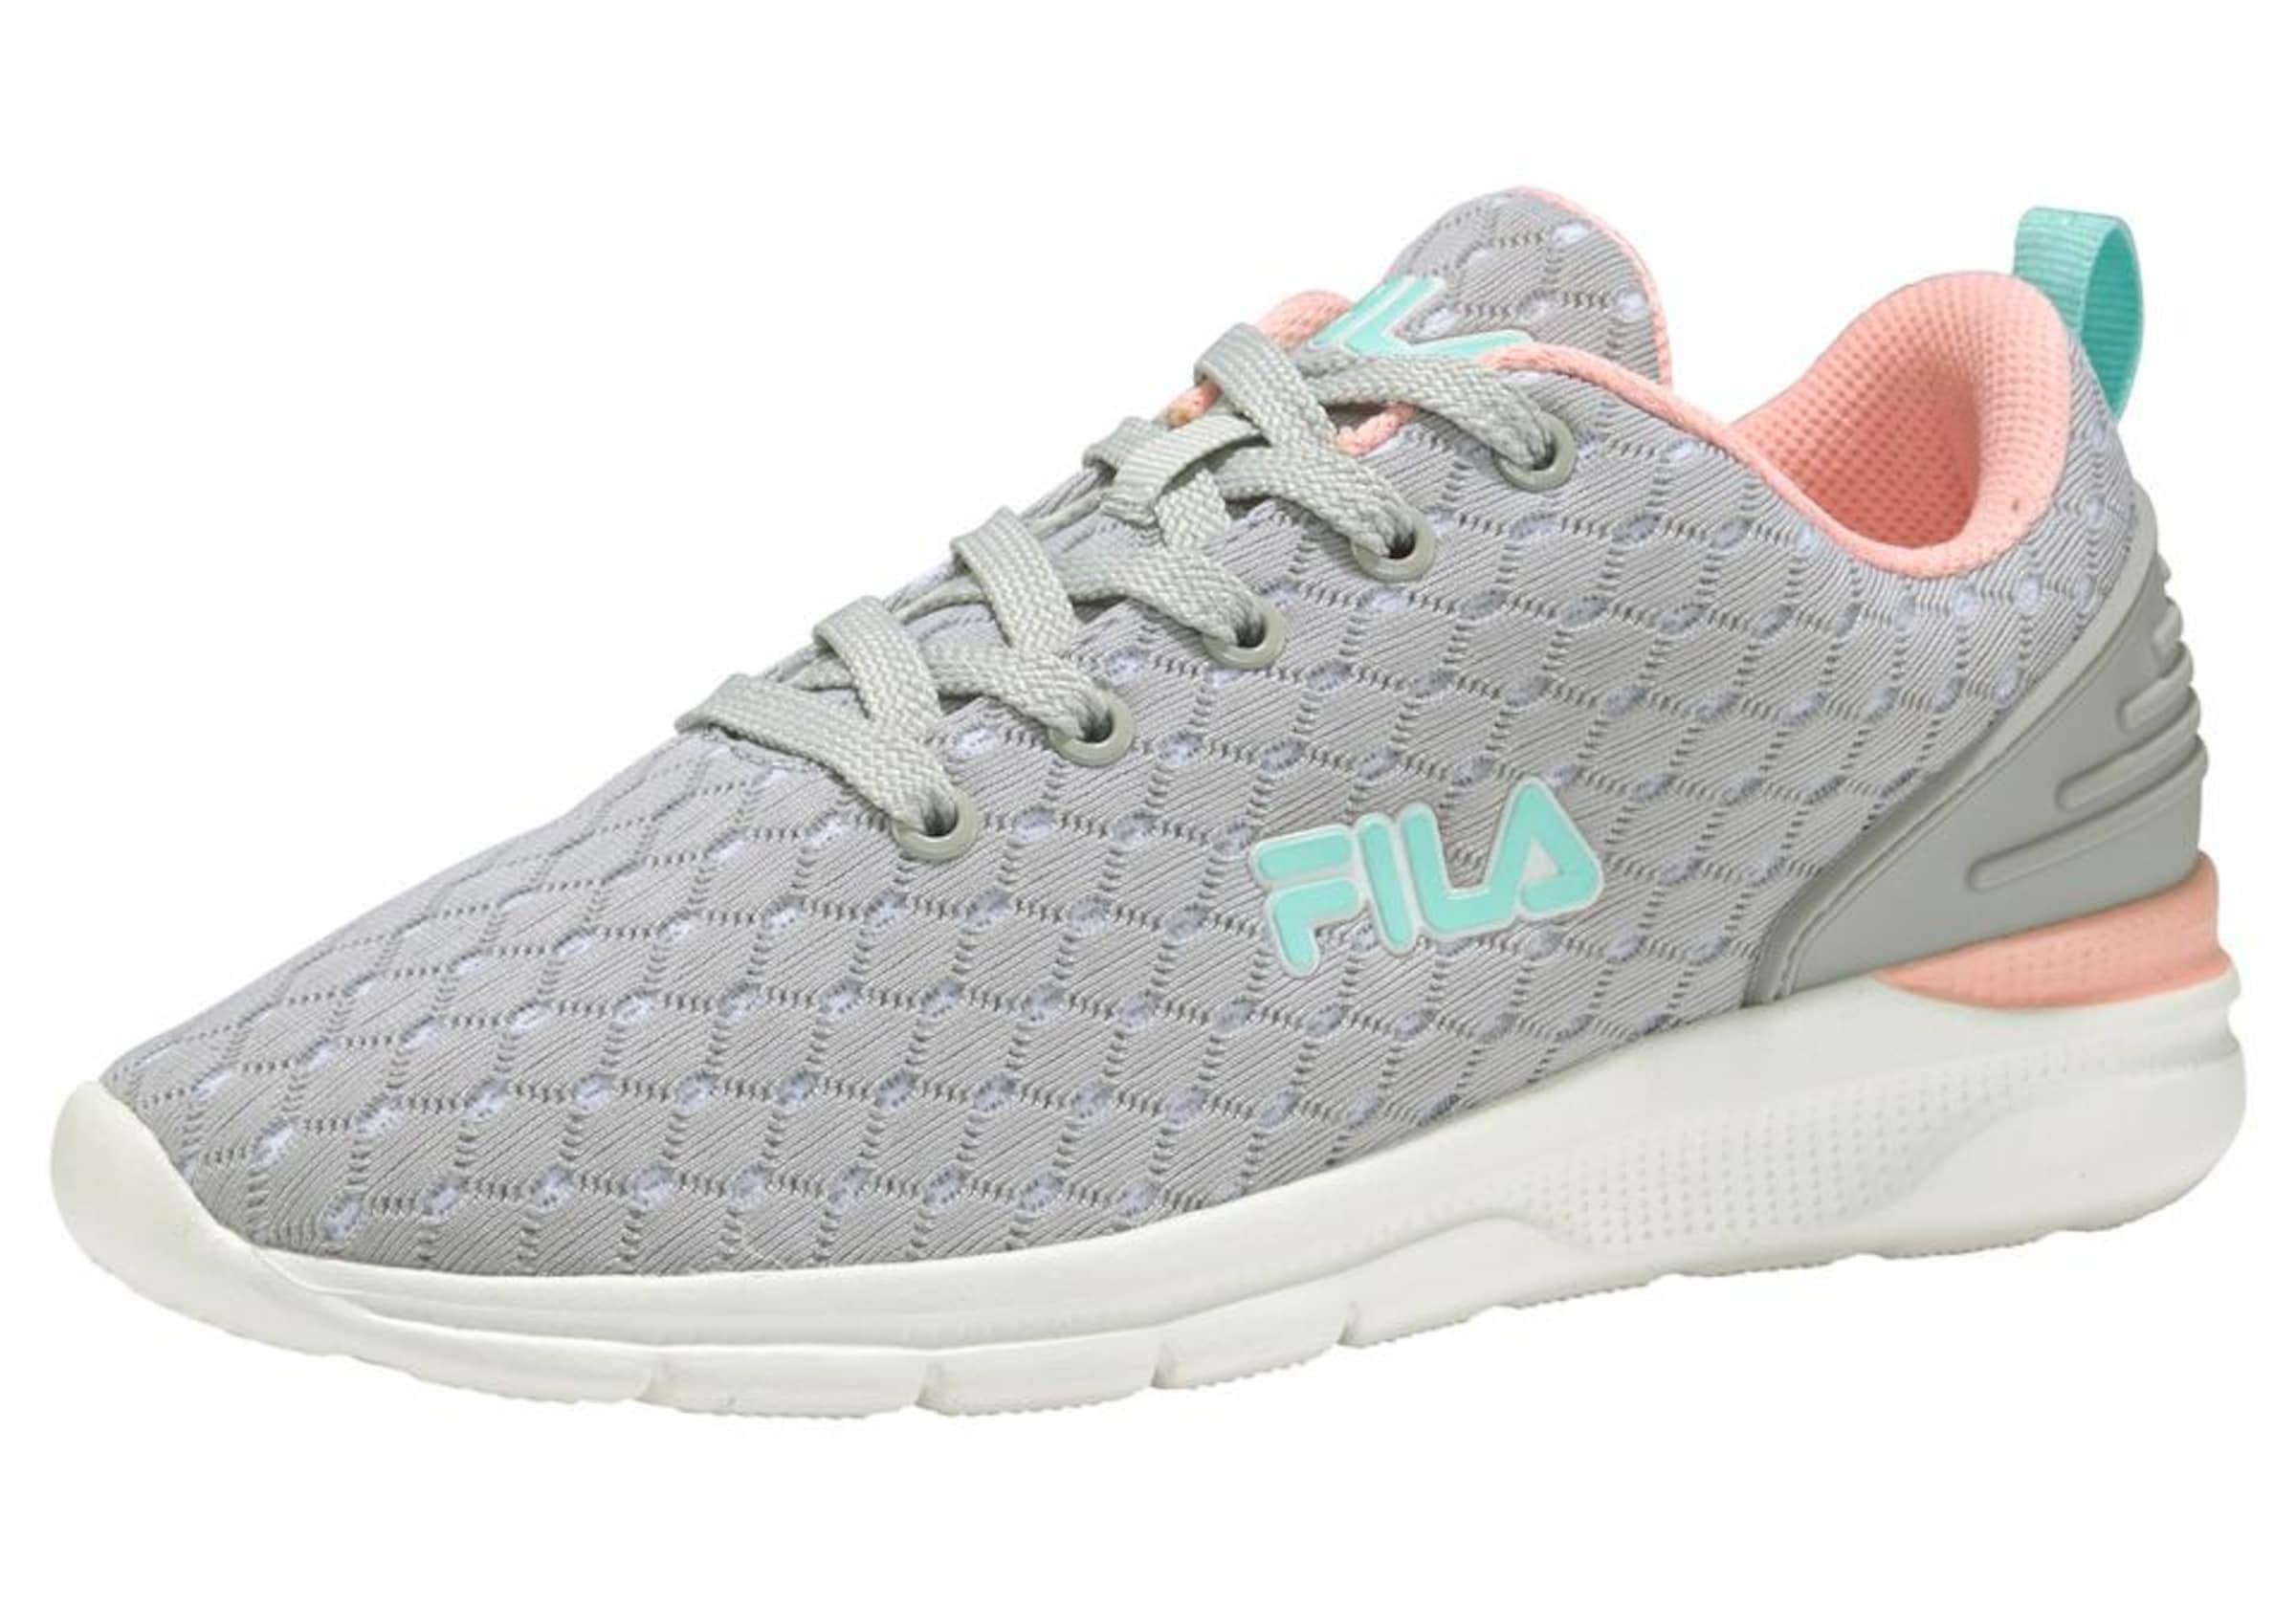 FILA Sneaker Fury Run 3 Low